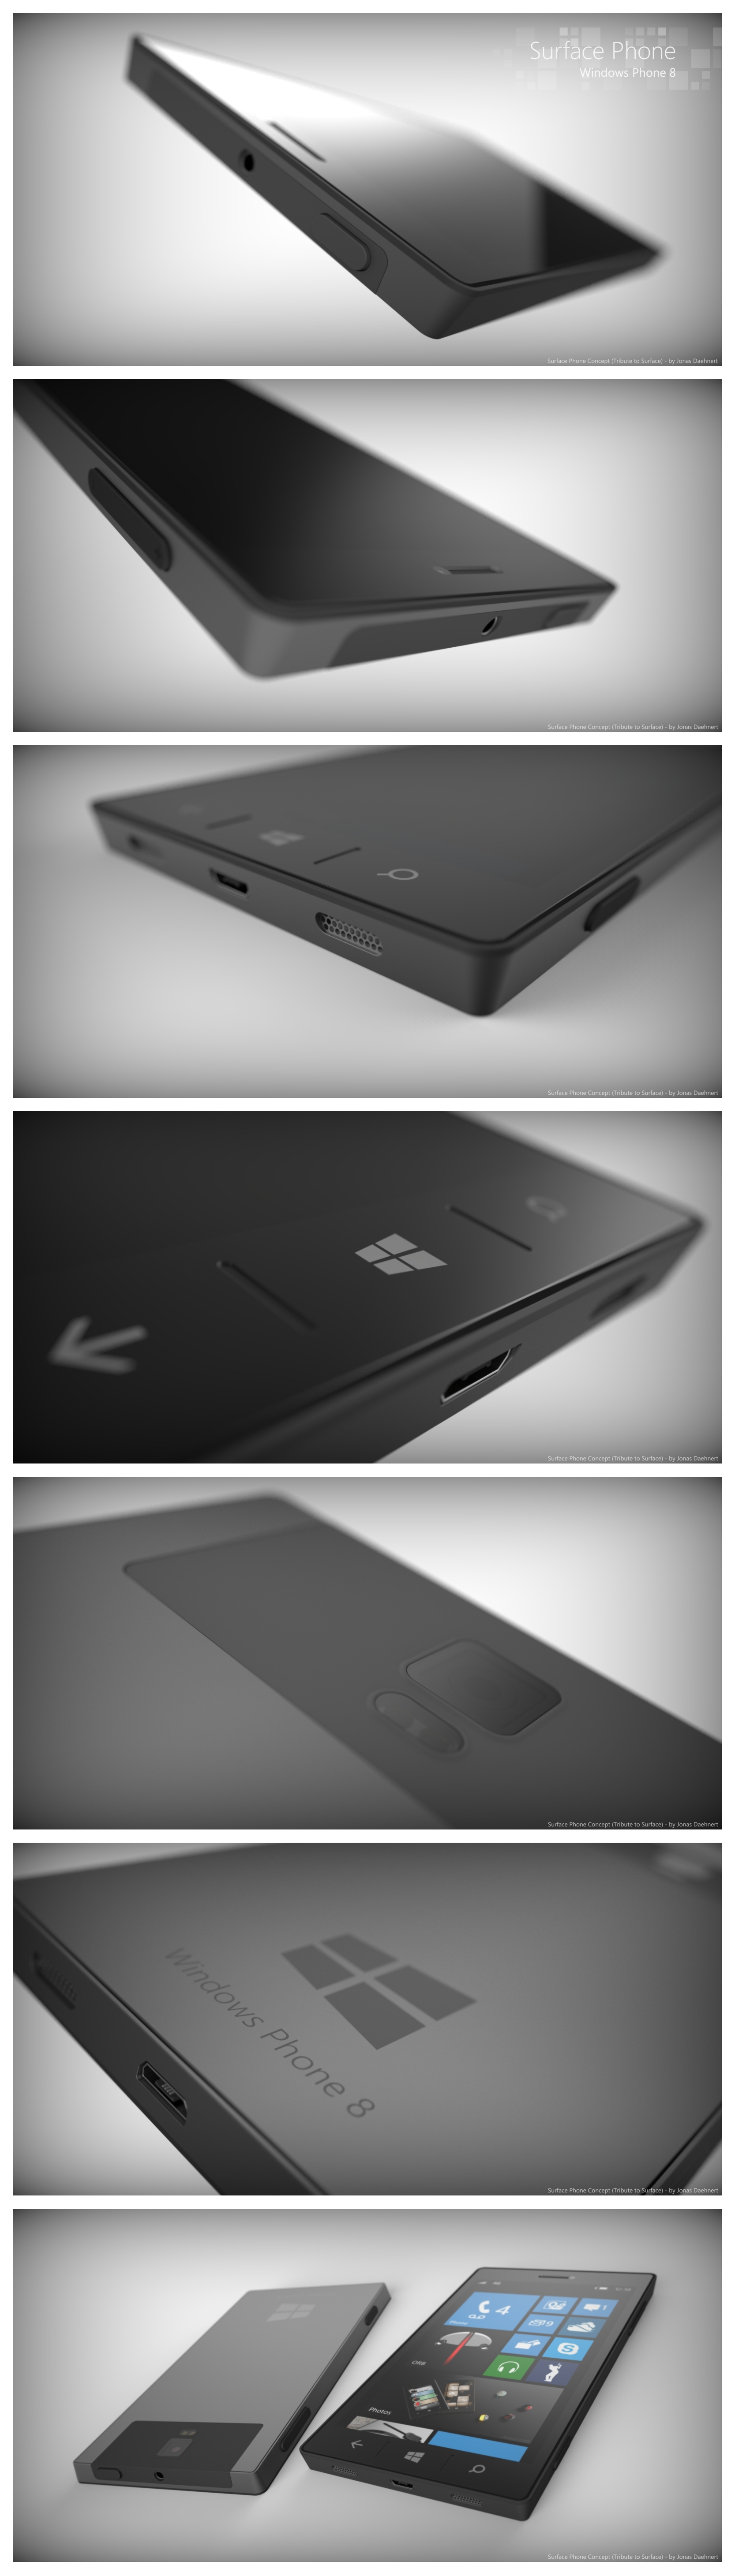 Microsoft Surface Phone Details by JonDae